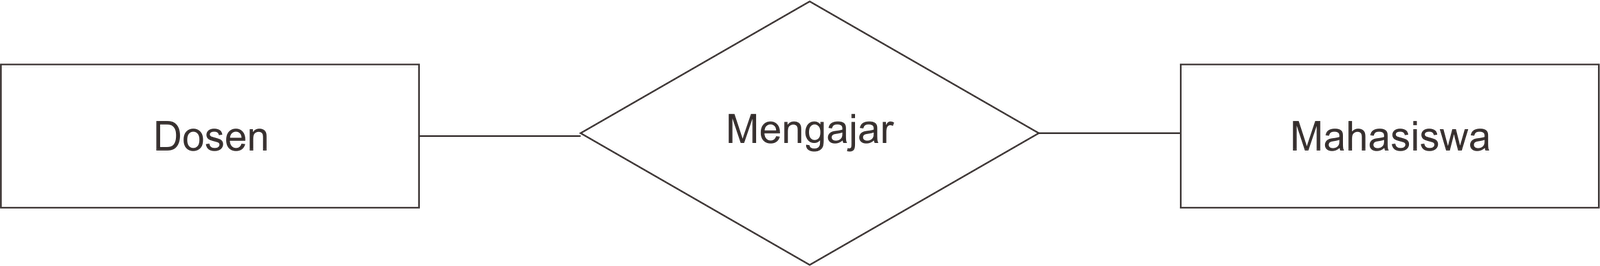 Contoh diagram garis himpunan movie brot contoh diagram garis himpunan dalam matematika the ccuart Images